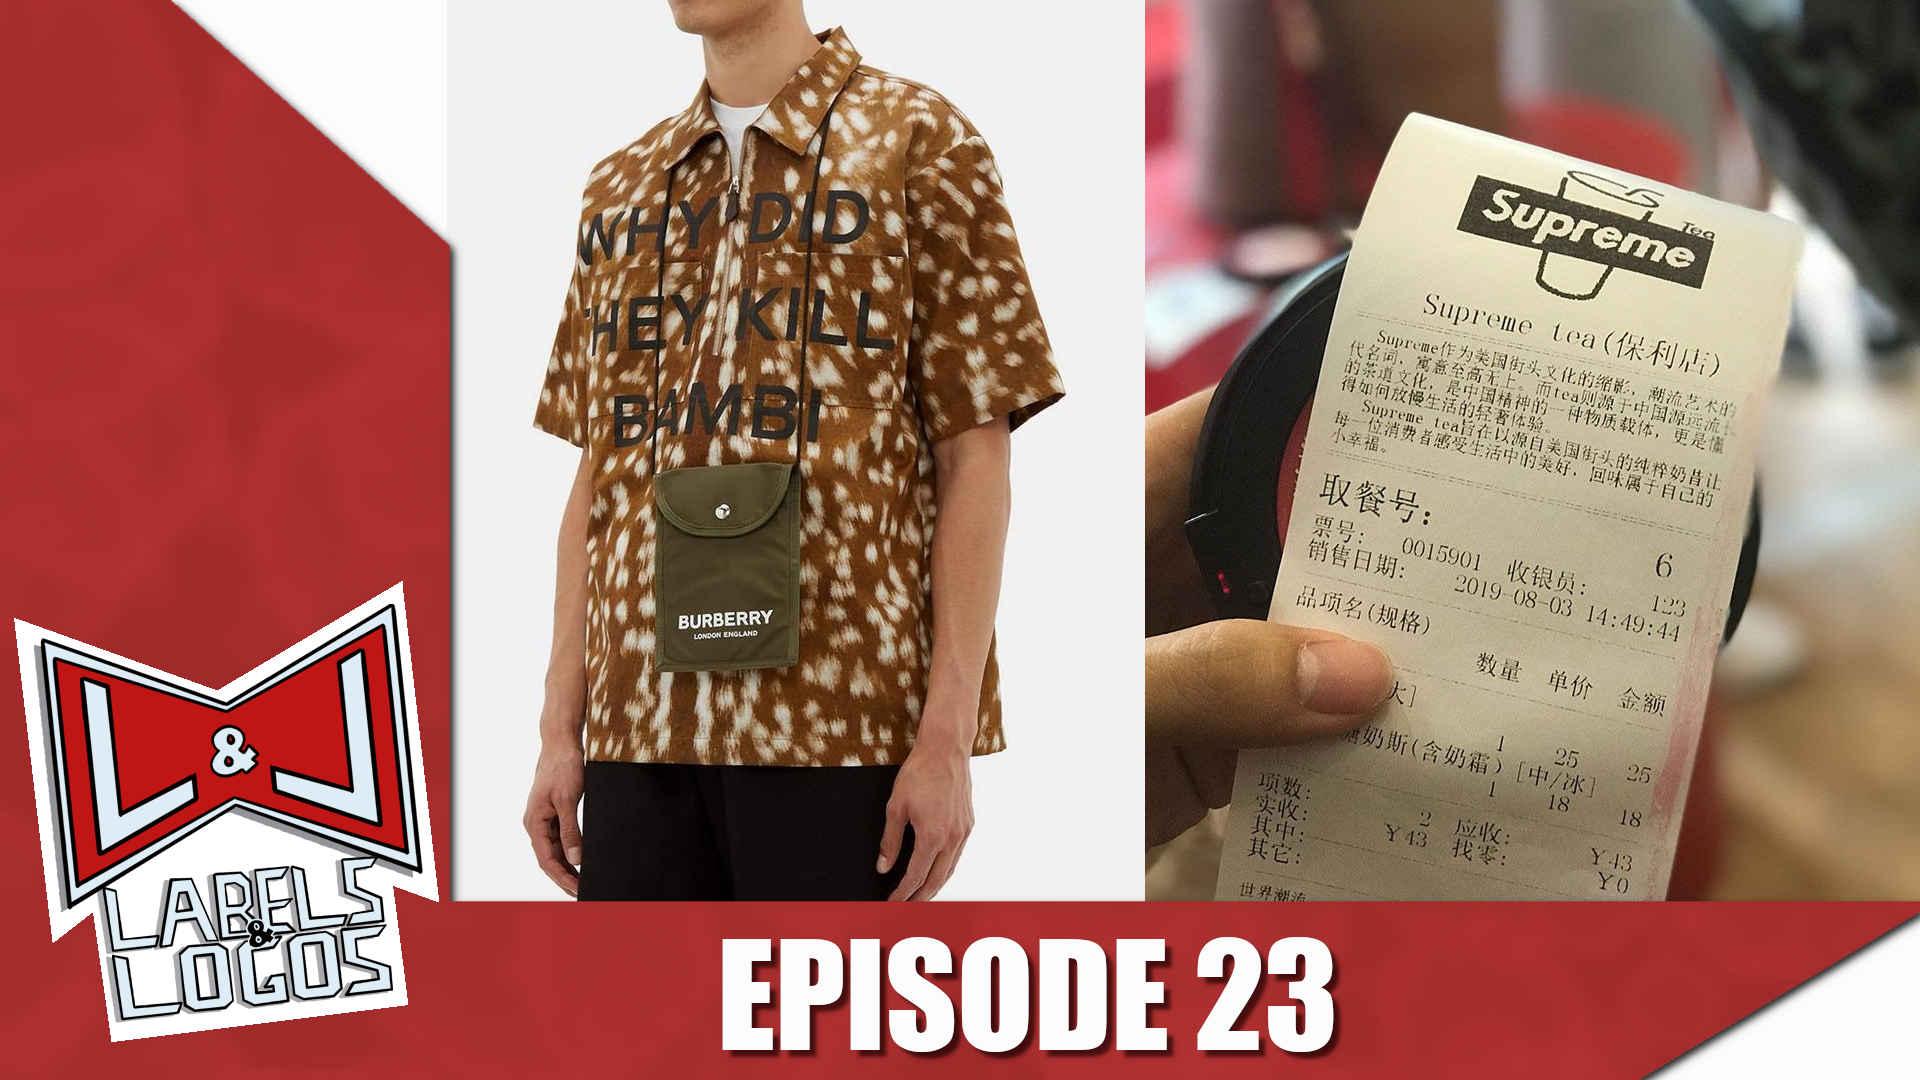 Labels & Logos - Episode 23 - Supreme